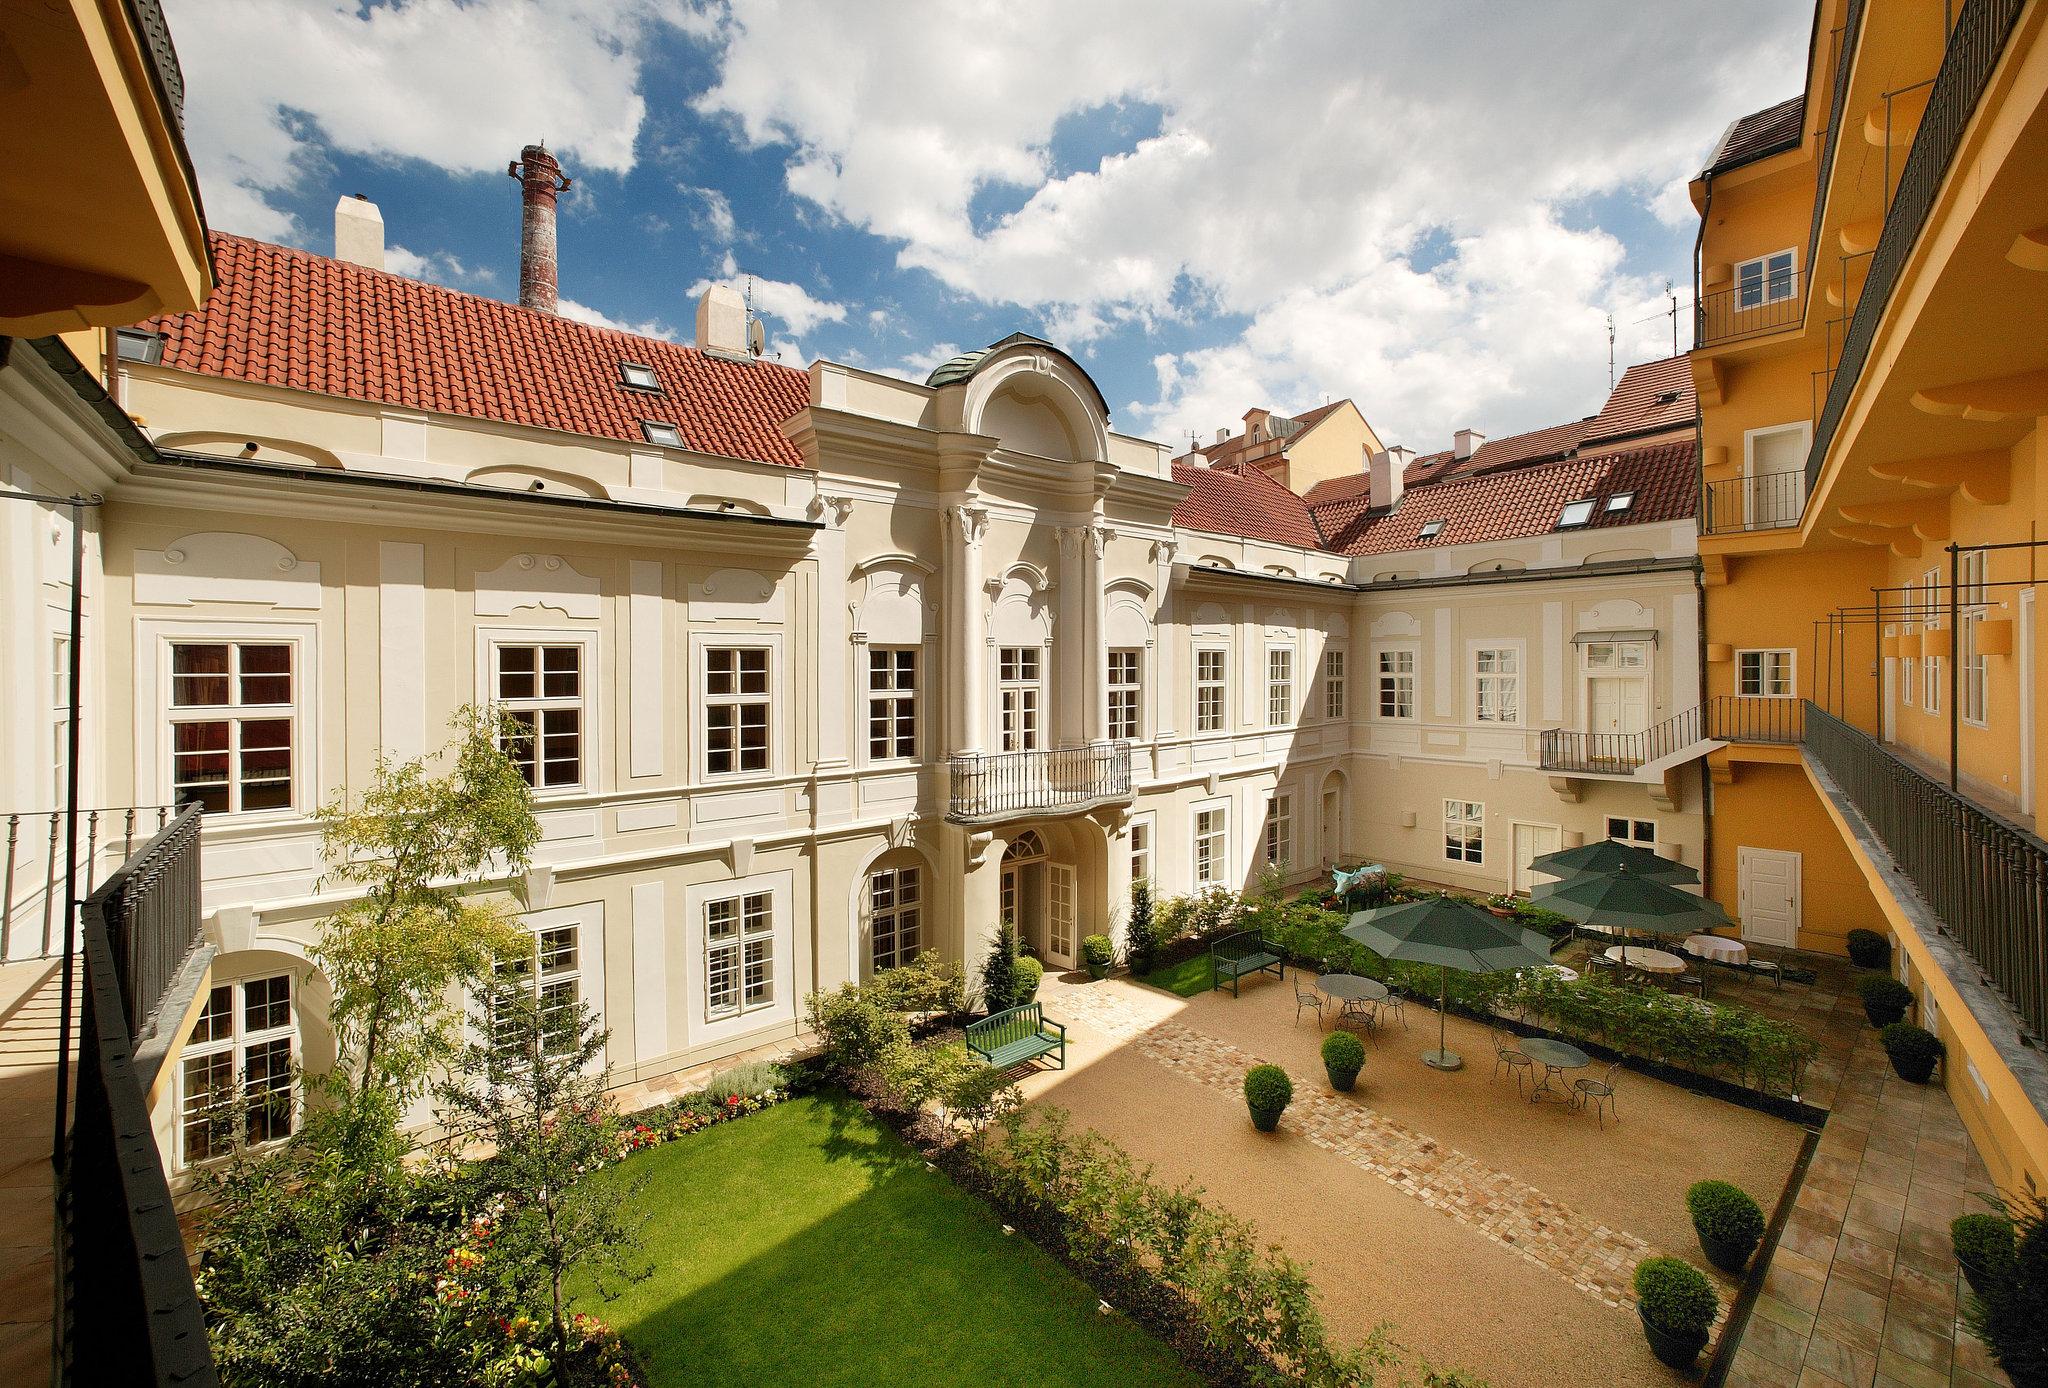 Mamaison Suite Hotel, Pachtuv Palace, Prague